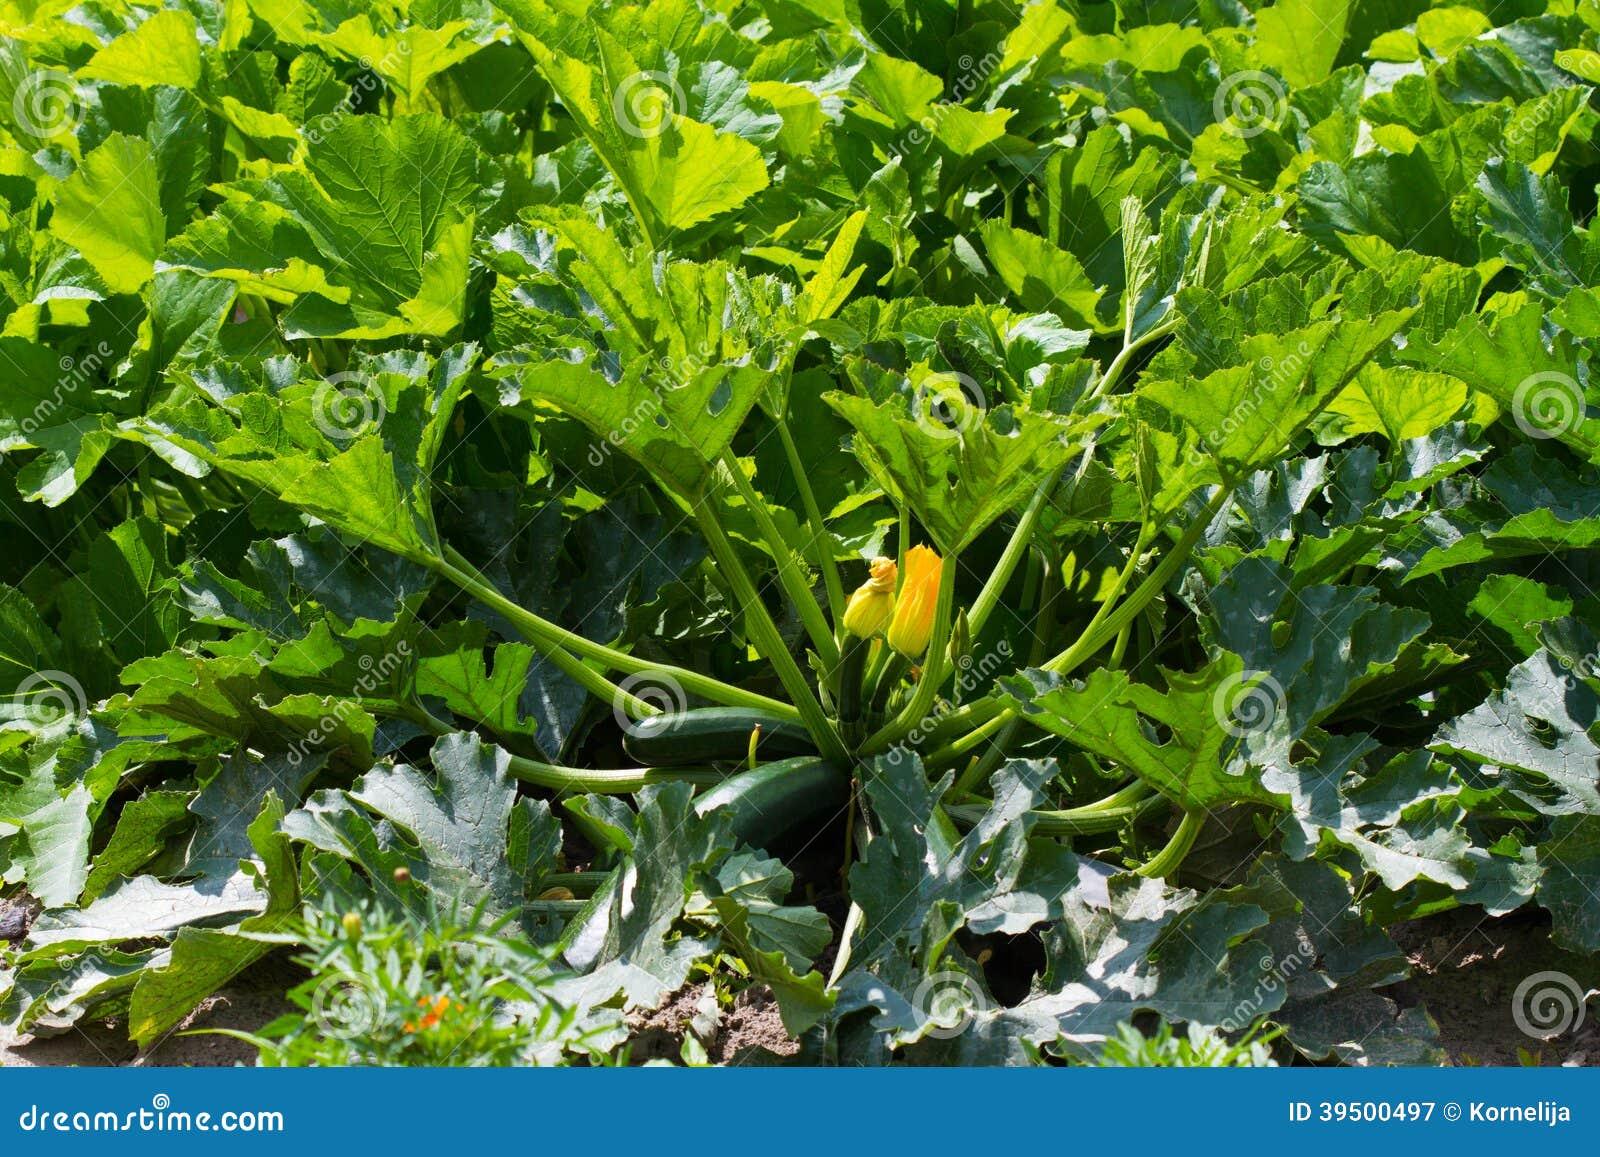 Marrow plant